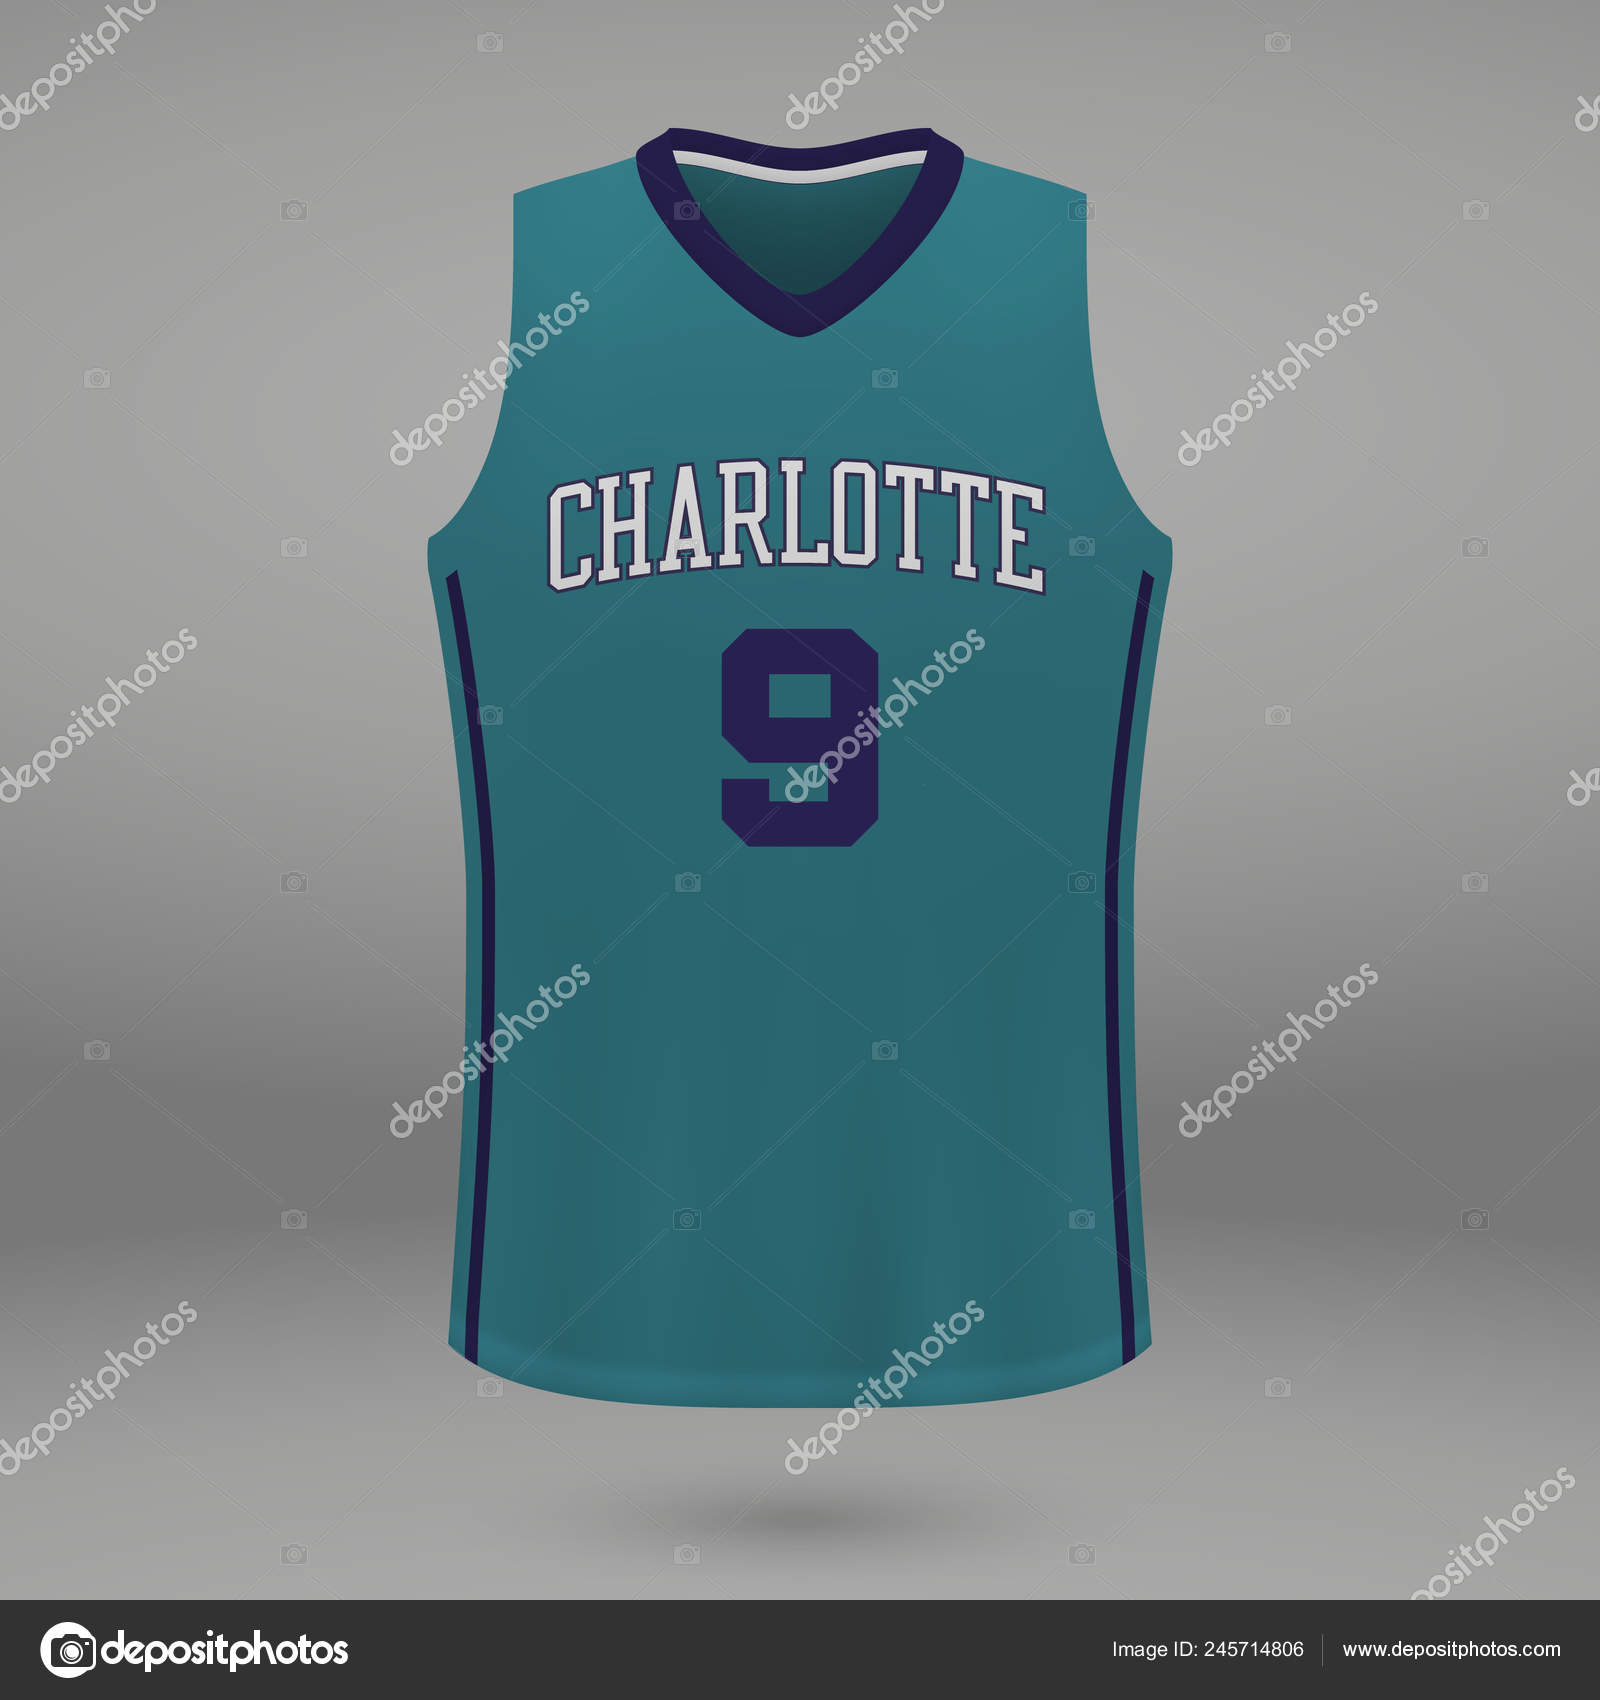 879c0fb155a charlotte hornets jersey font